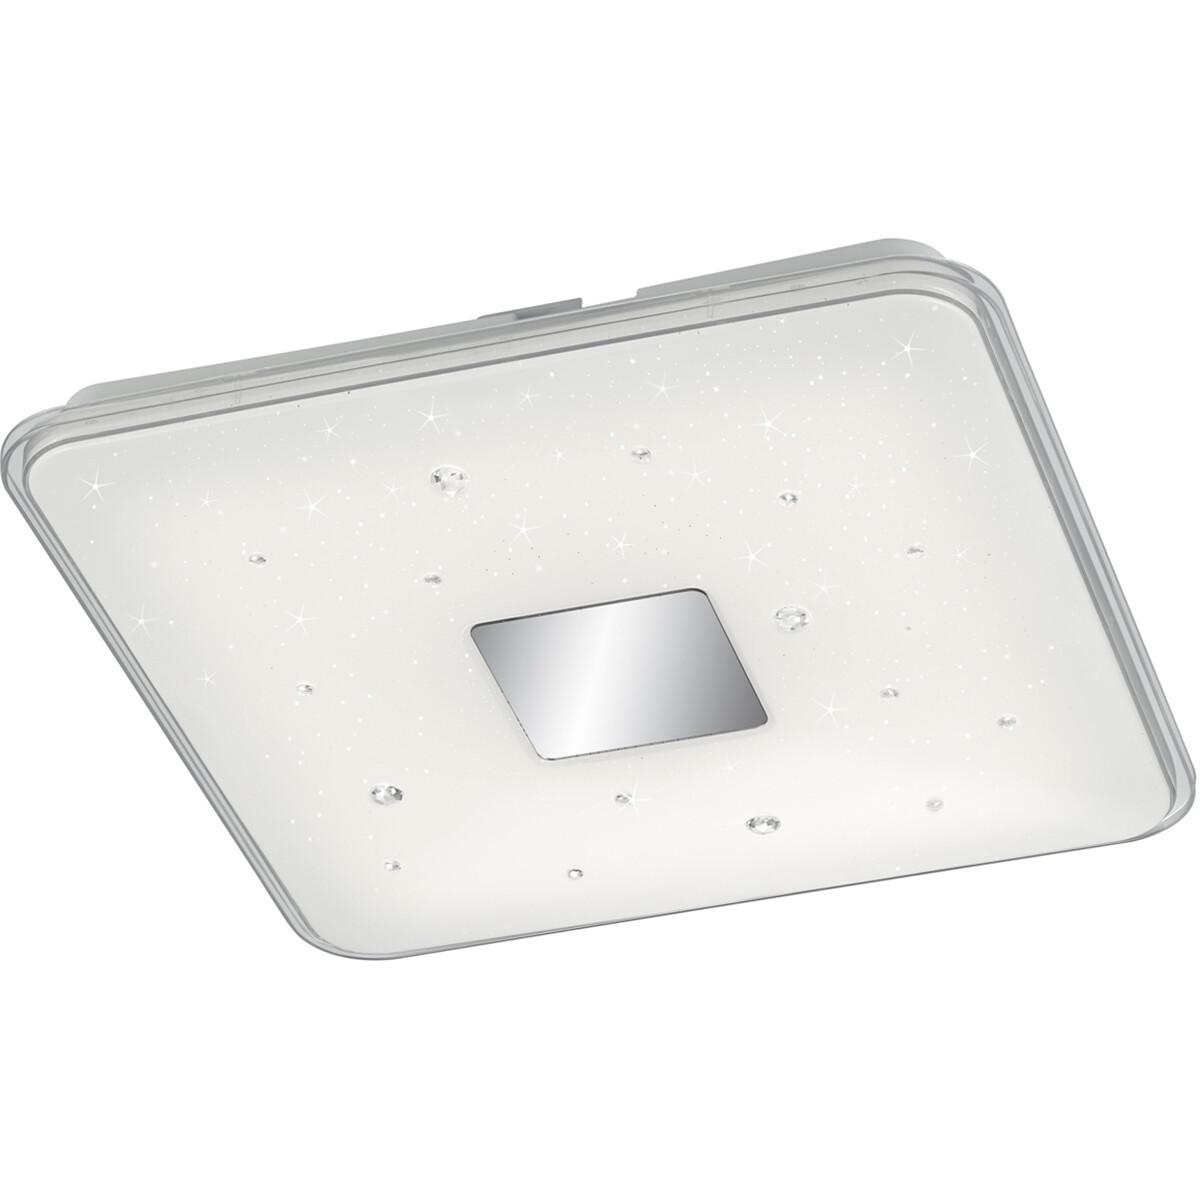 LED Plafondlamp - Trion Rikon - 30W - Aanpasbare Kleur - Dimbaar - Afstandsbediening - Sterlicht - V